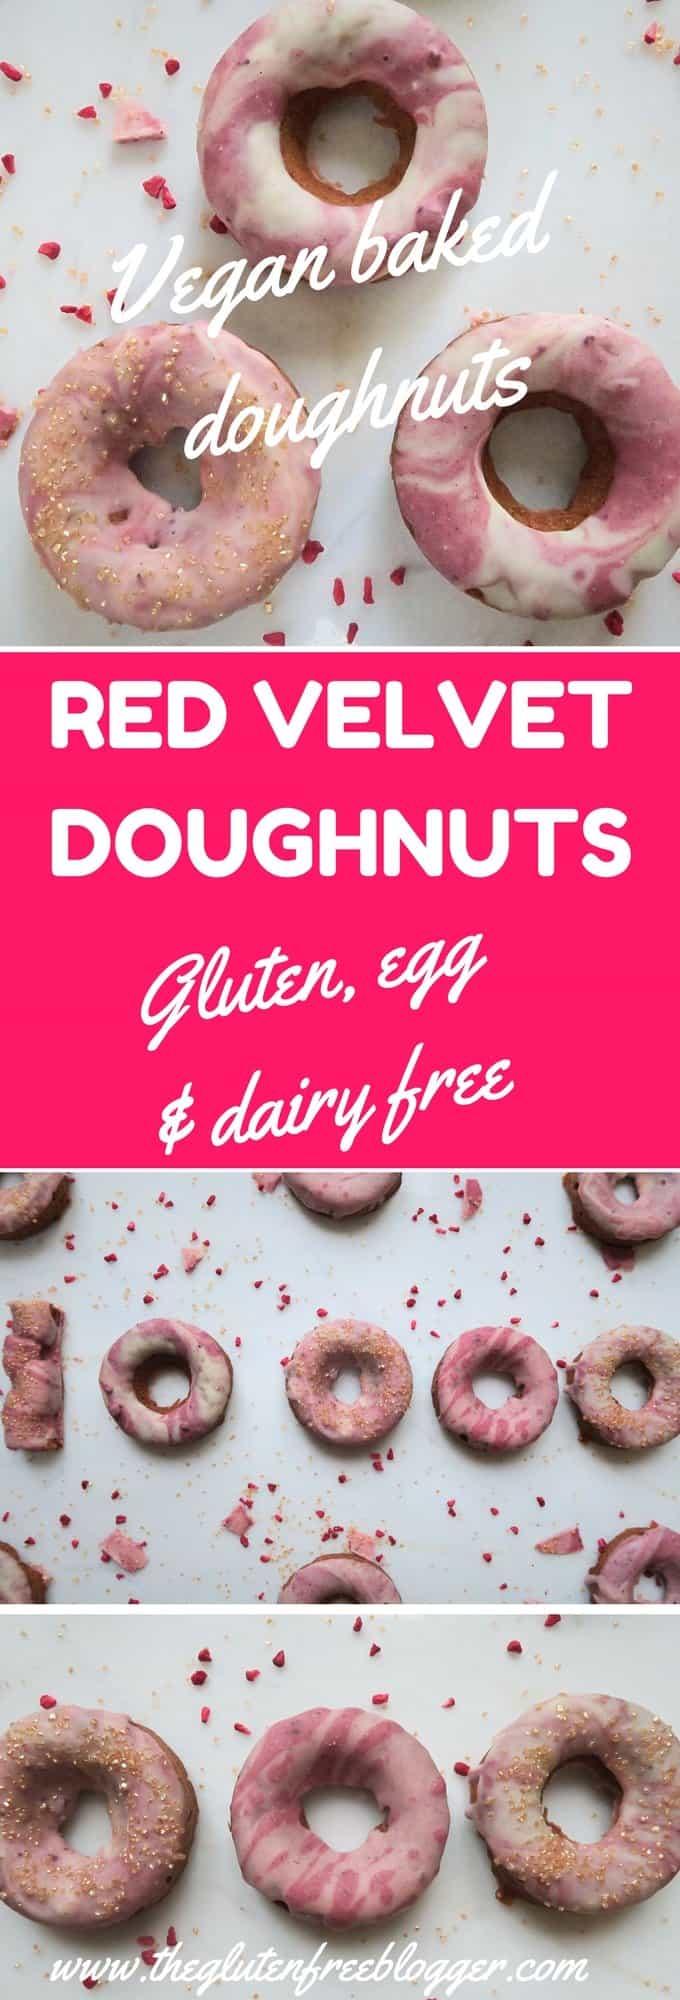 Gluten free and vegan red velvet doughnuts - baked doughnuts, a recipe from The Gluten Free Blogger. www.theglutenfreeblogger.com